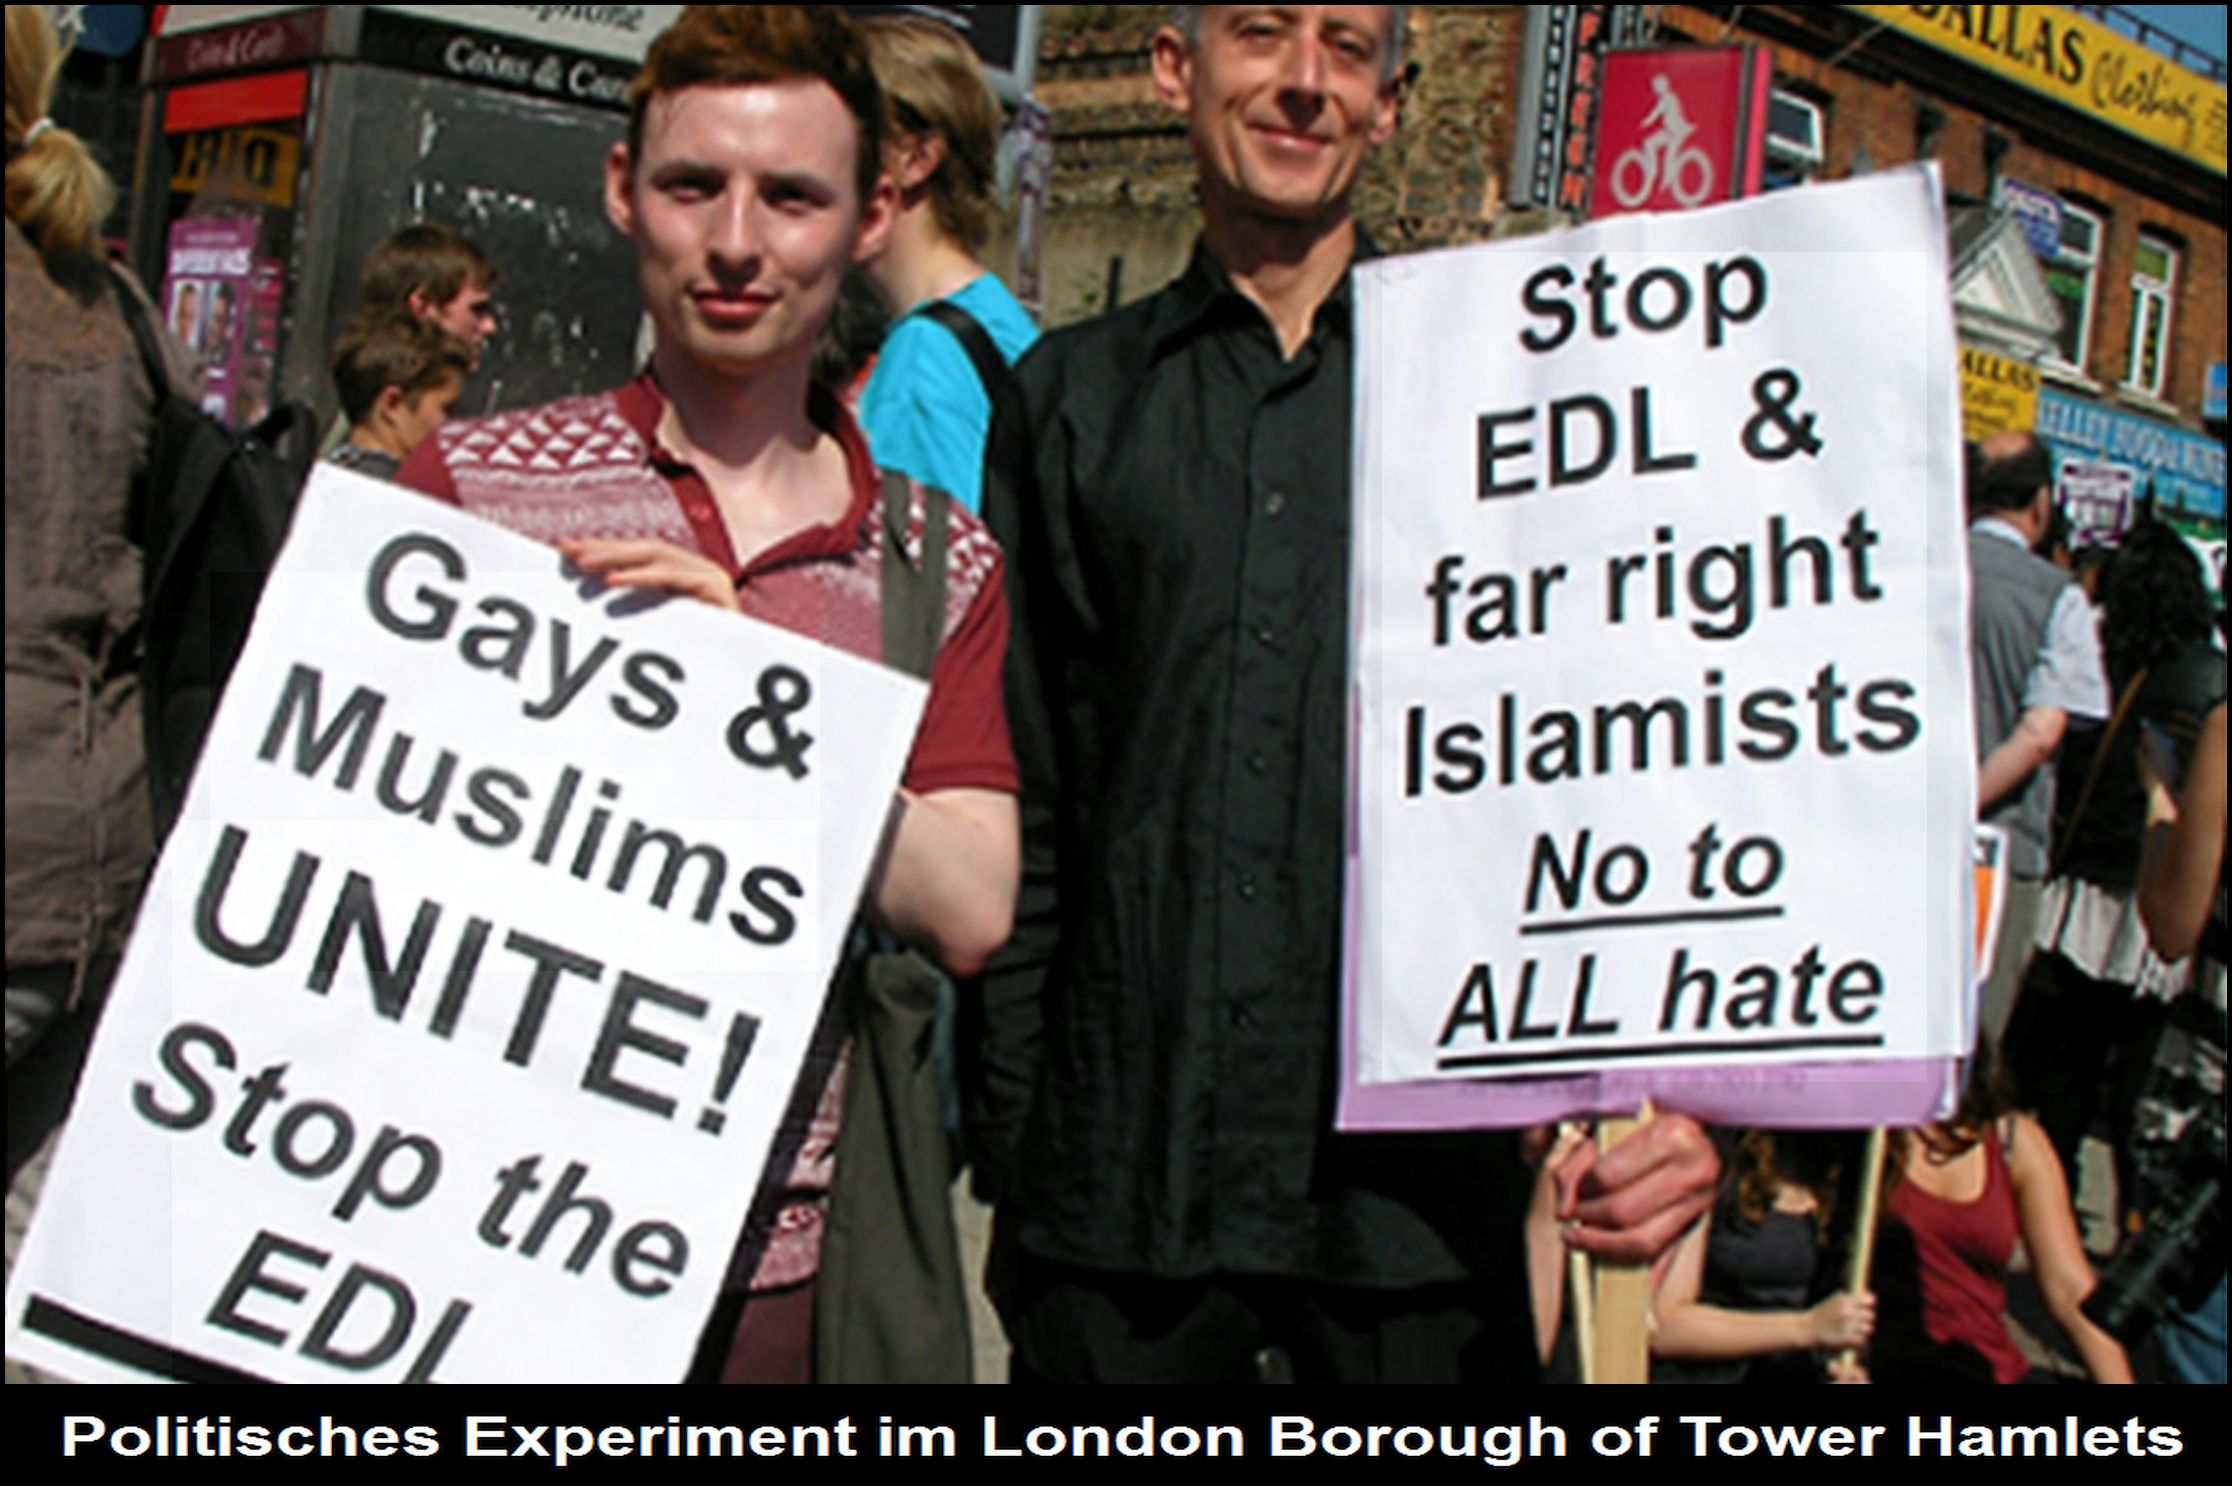 Tower Hamlets Islam